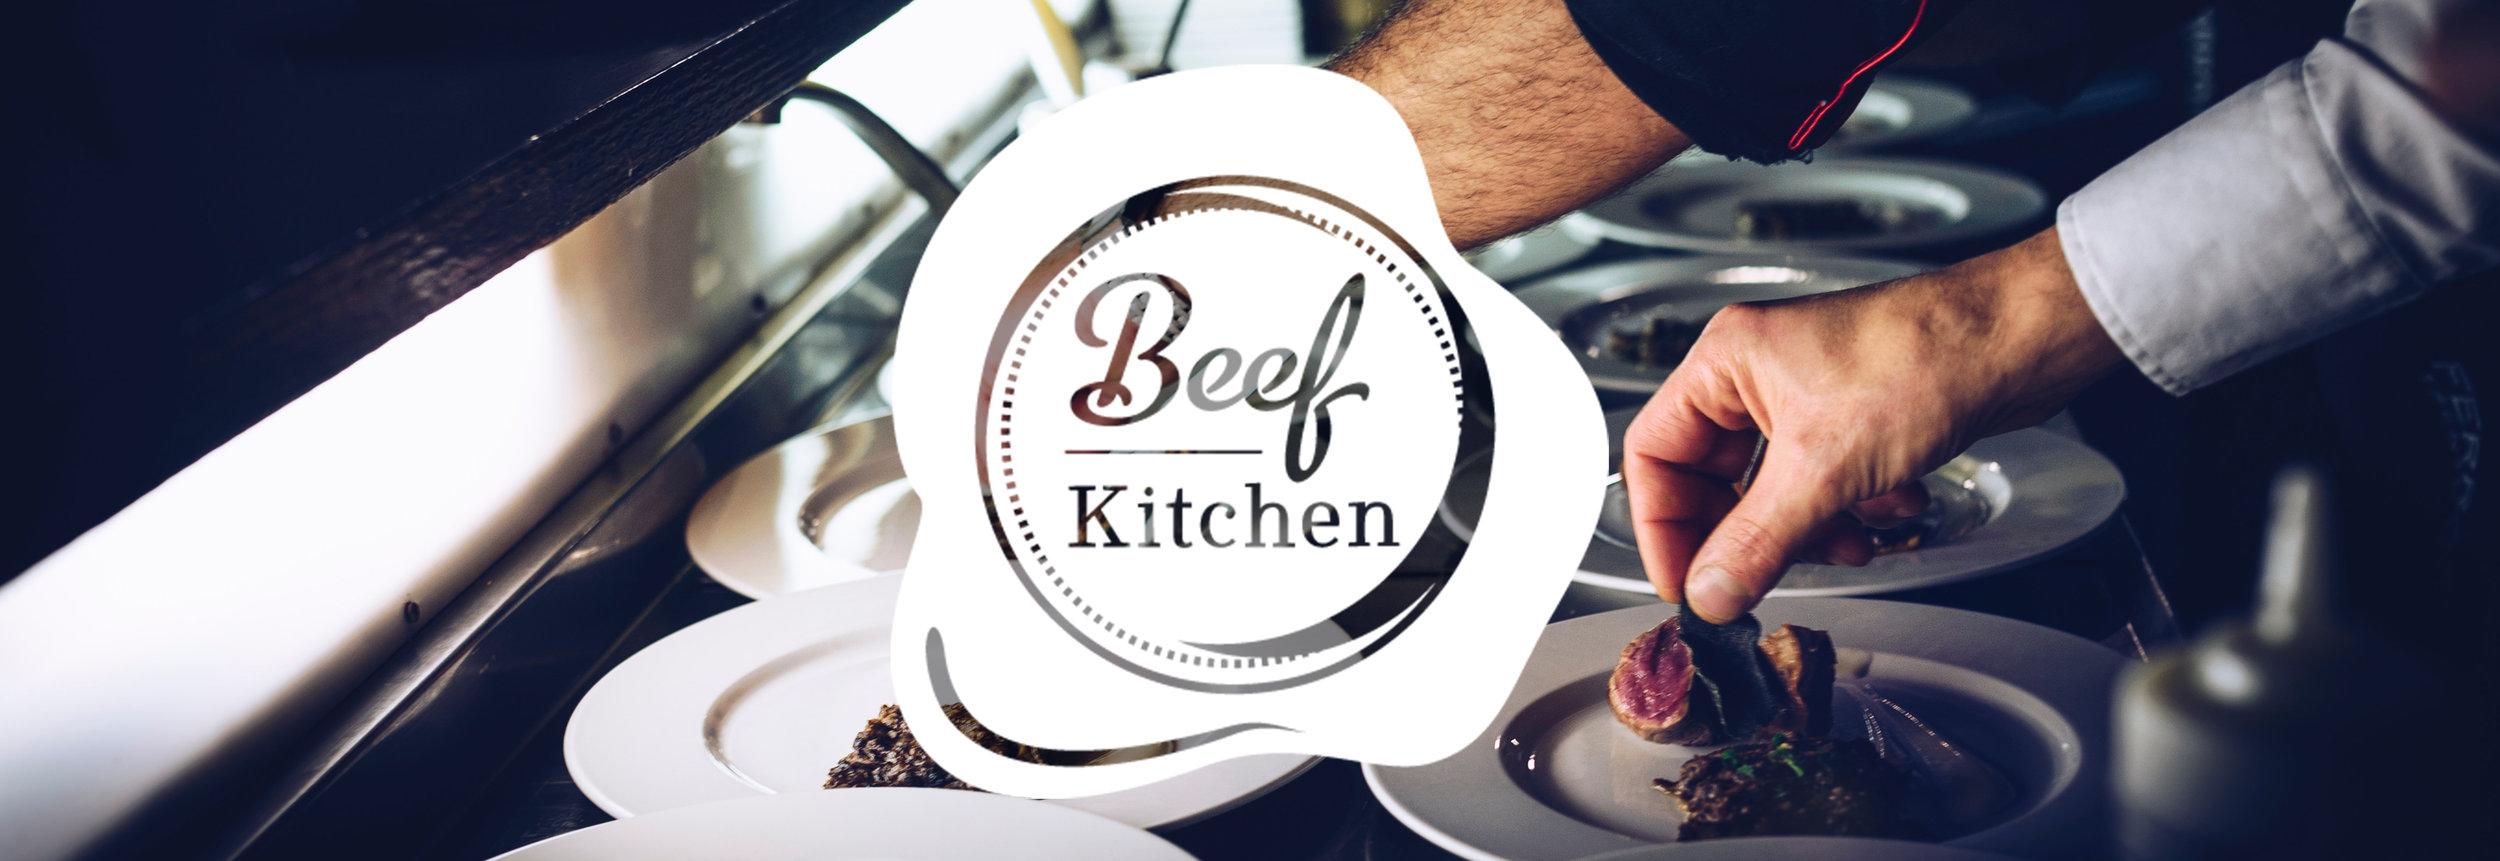 cooking_logo_cut.jpg